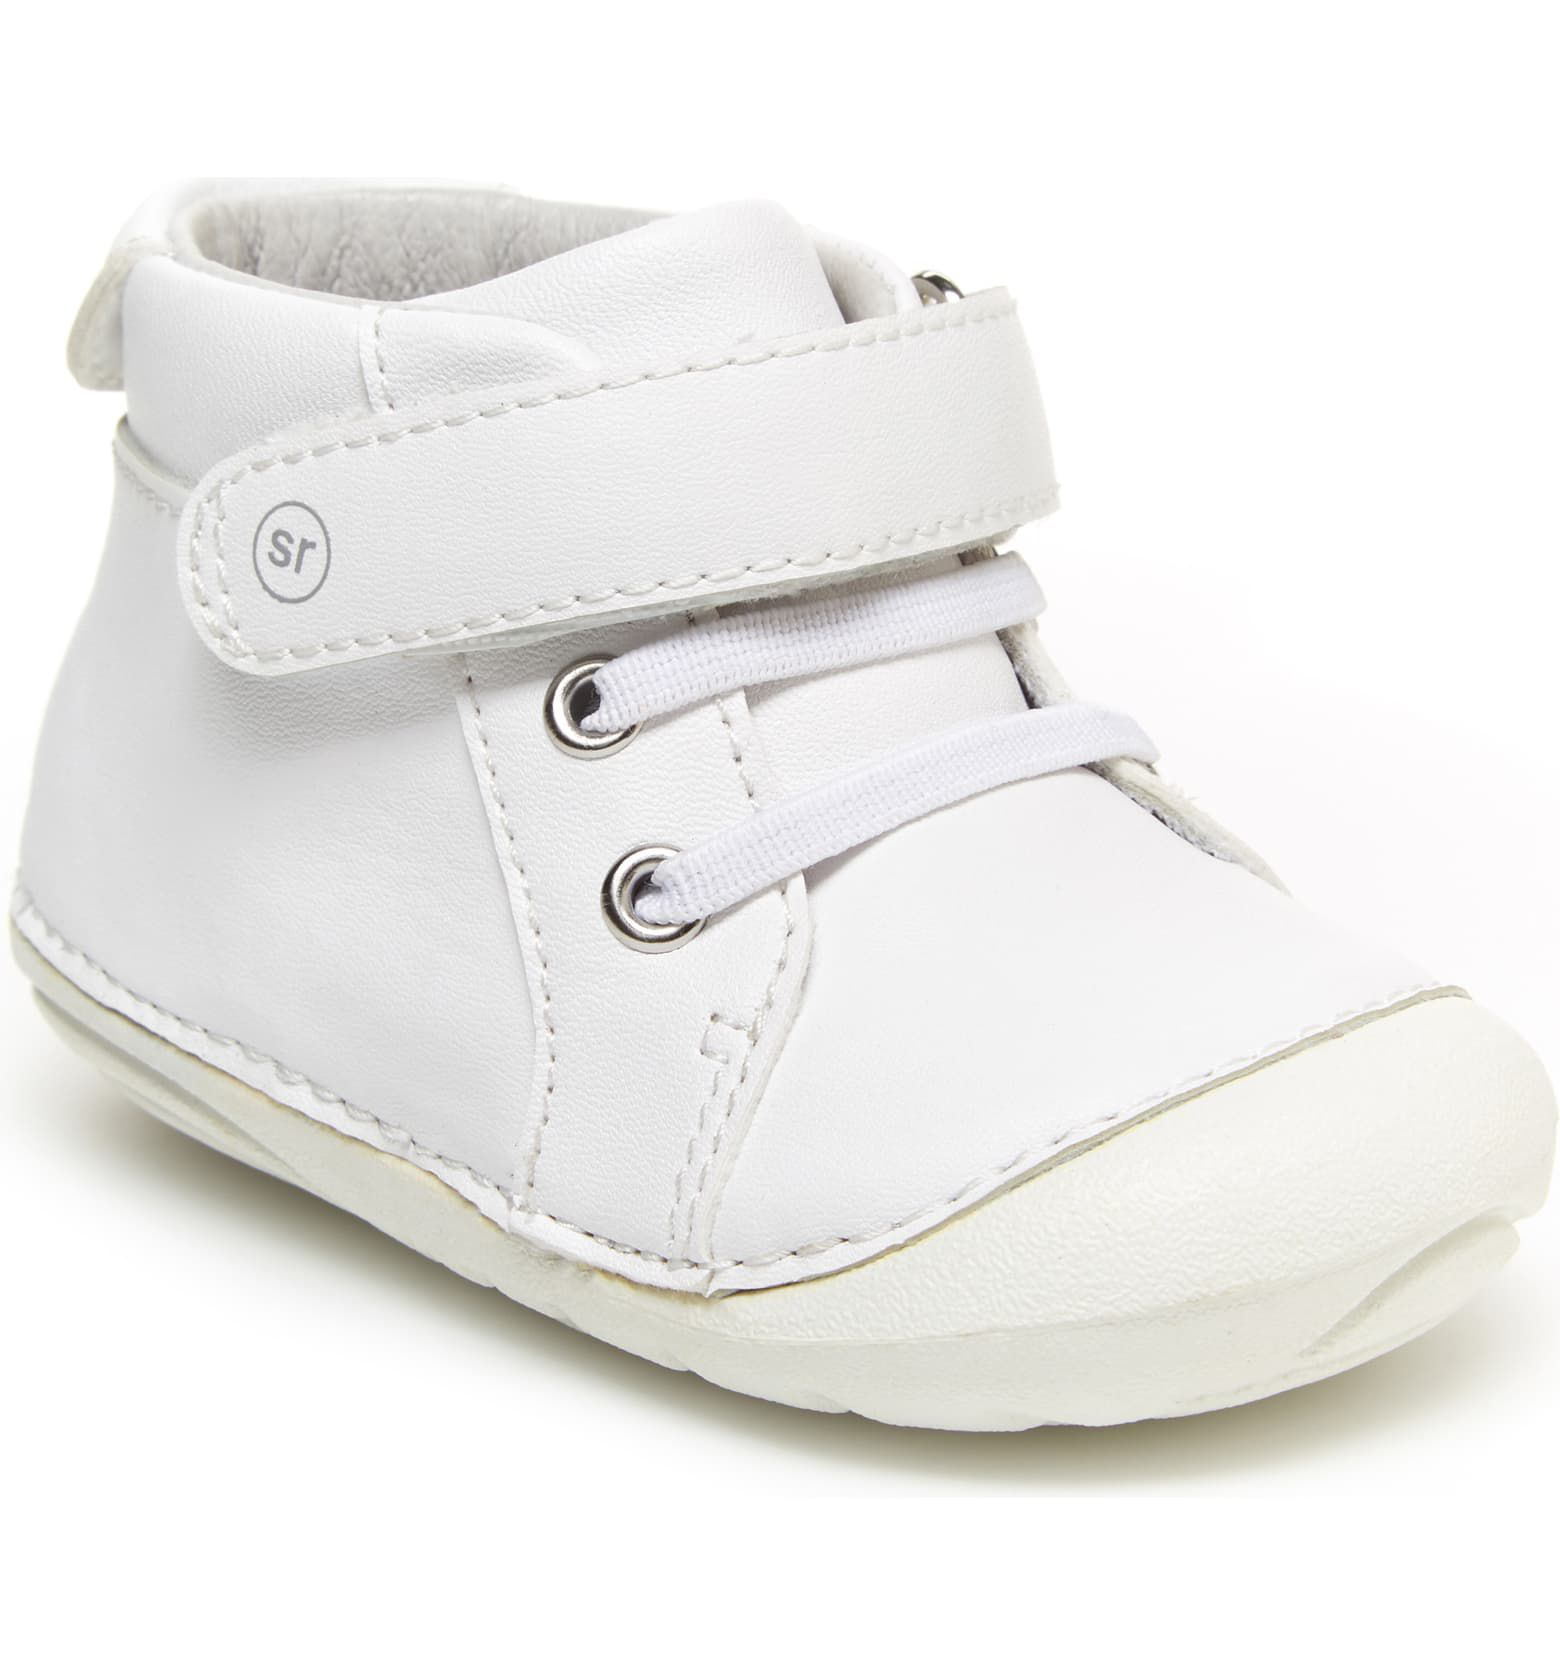 Stride Rite Soft Motion Frankie Sneaker